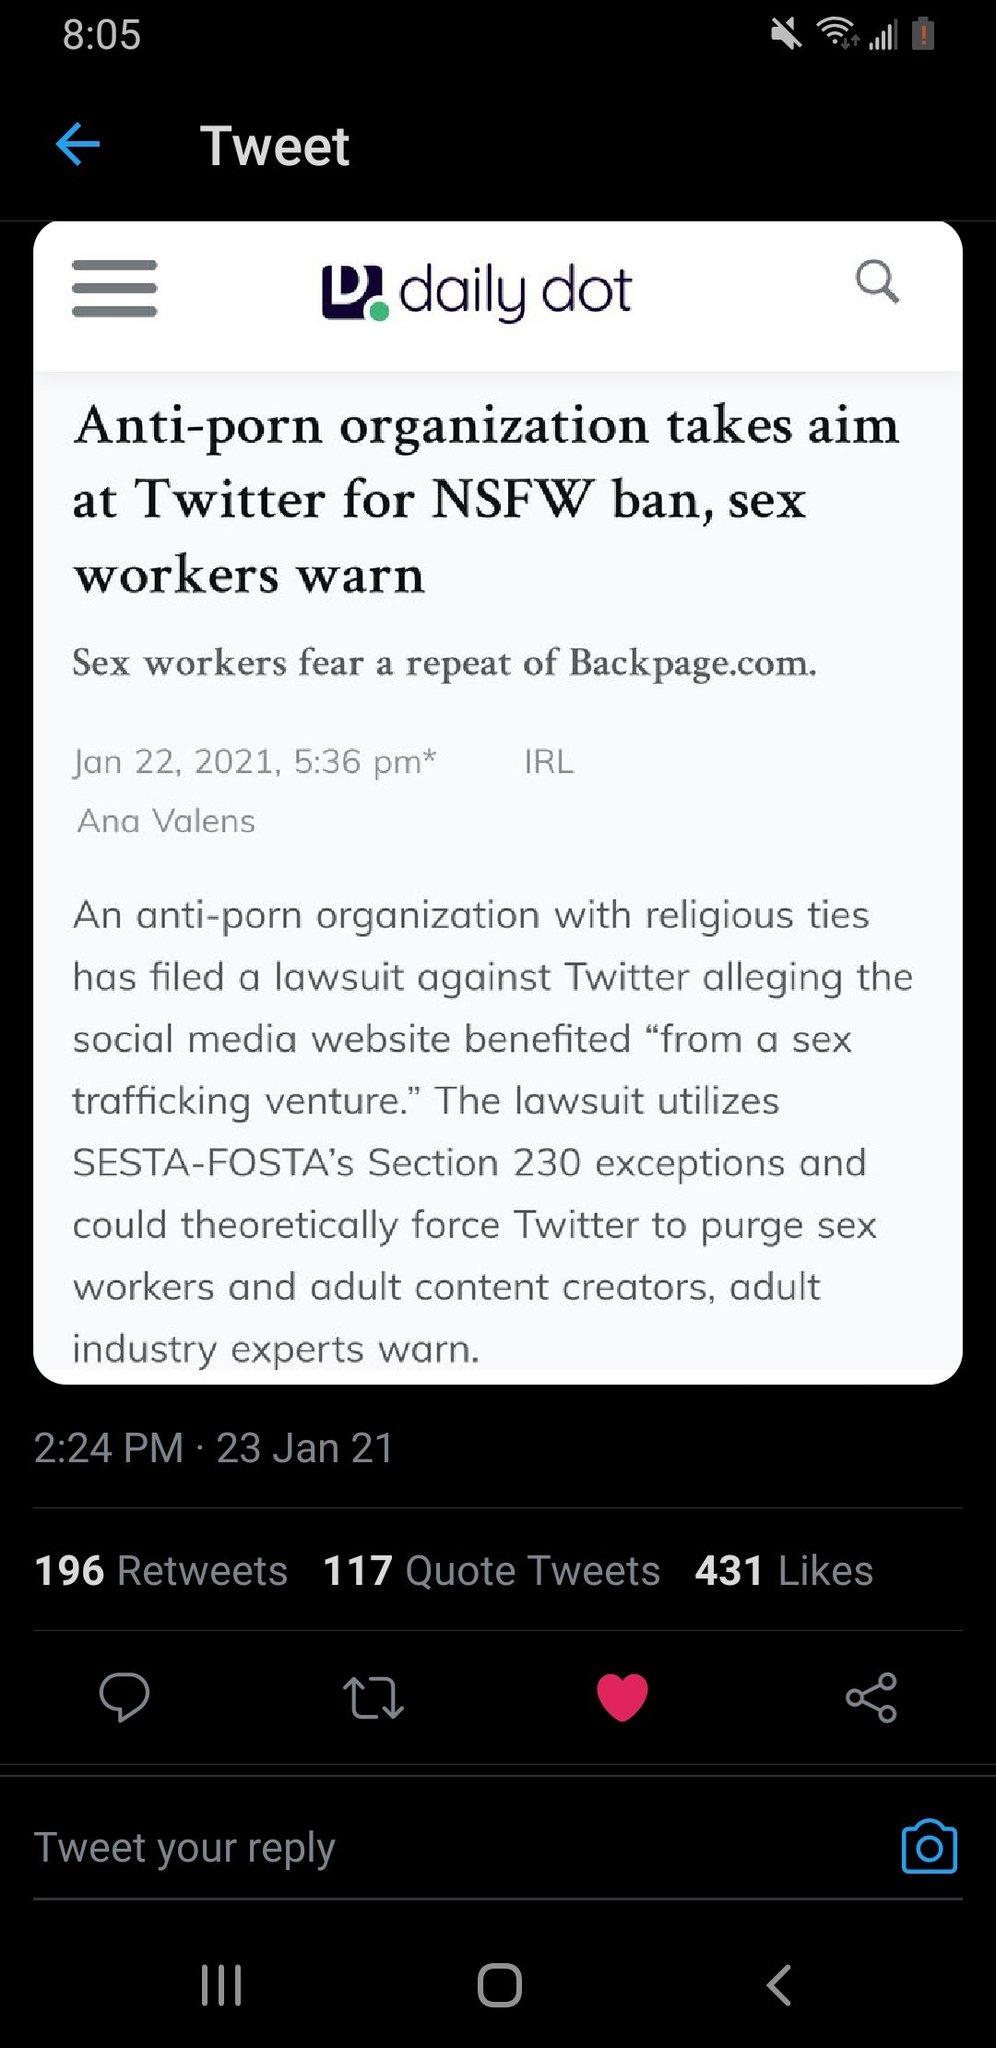 Twitter will ban NSFW content - meme